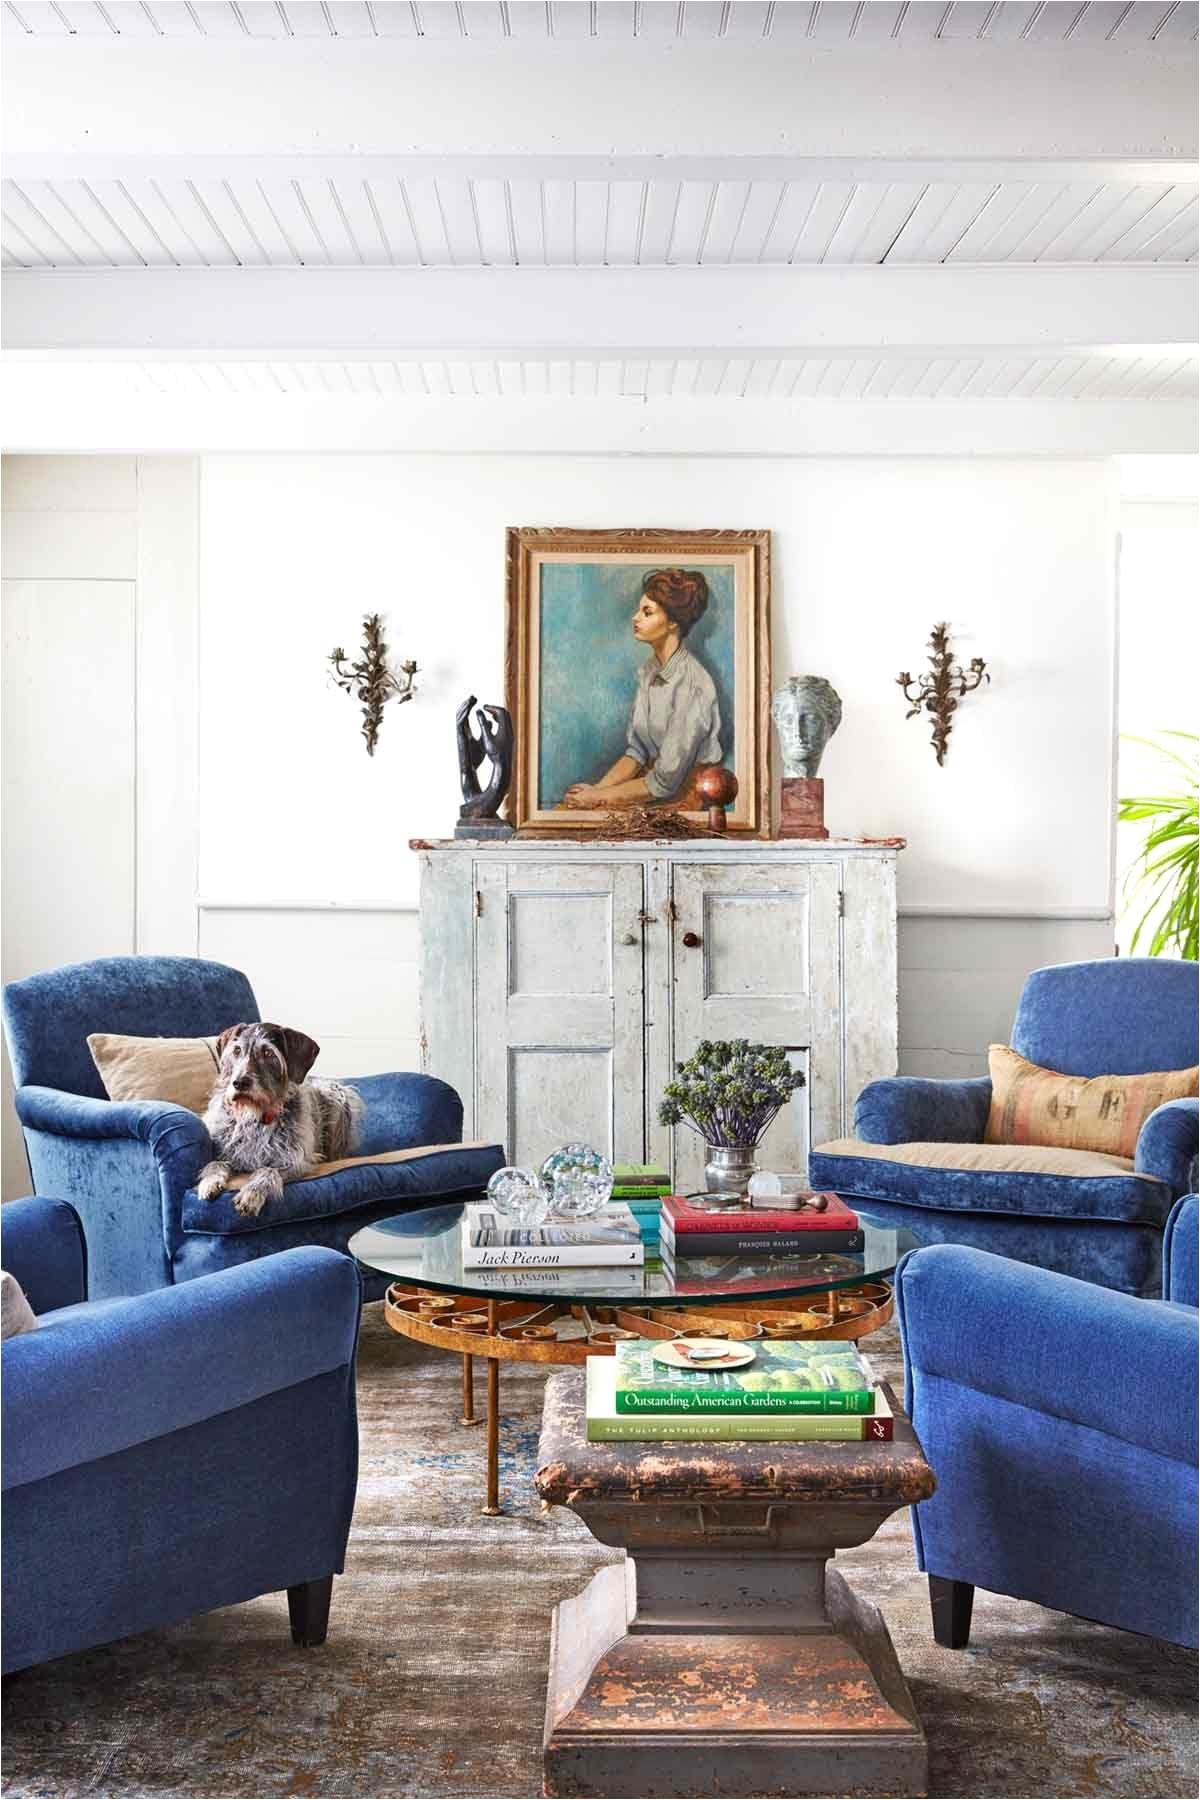 0d modern furniture design for living room best white living room furniture beautiful salon zdj